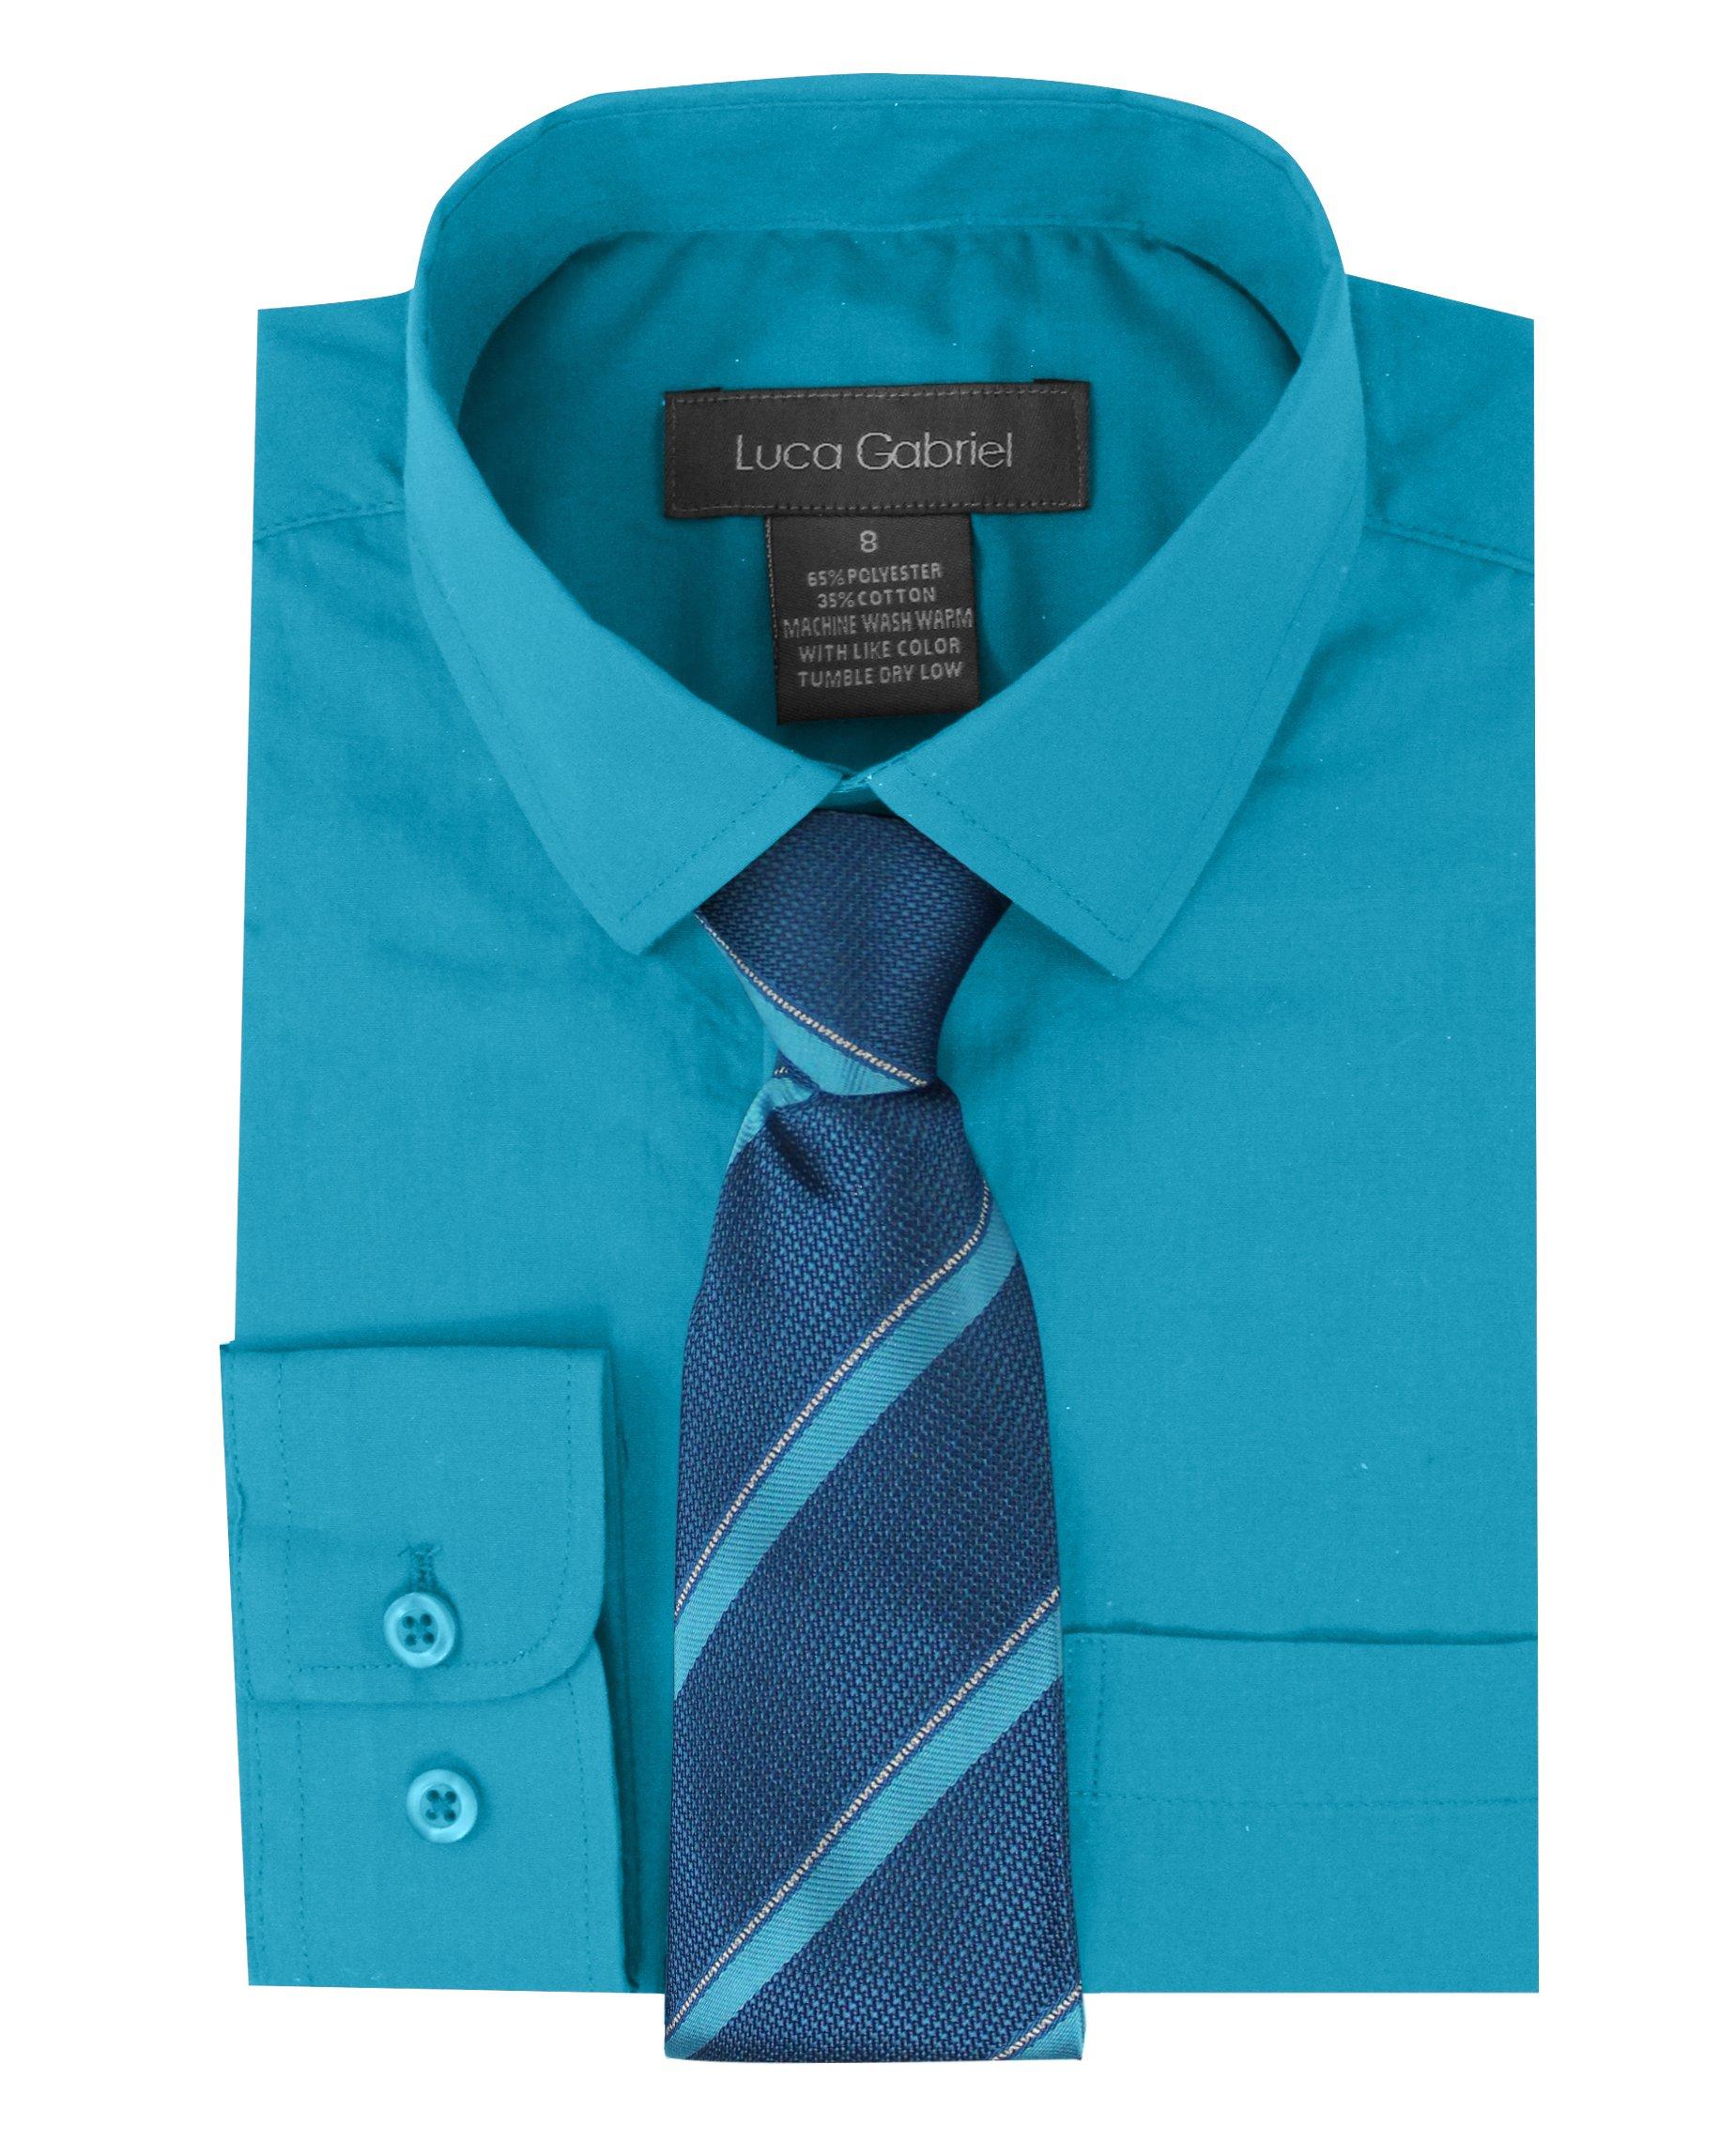 Luca Gabriel Toddler Boy's Long Sleeve Formal Button Down Dress Shirt & Tie Set - Turquoise Size 5